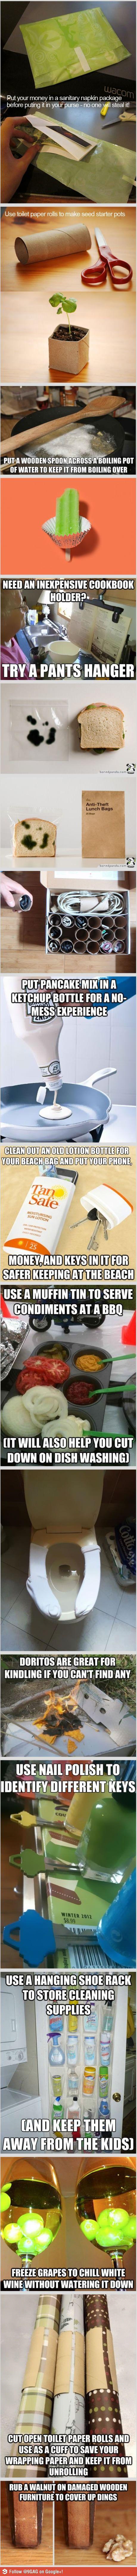 Good tips! Great Ideas!